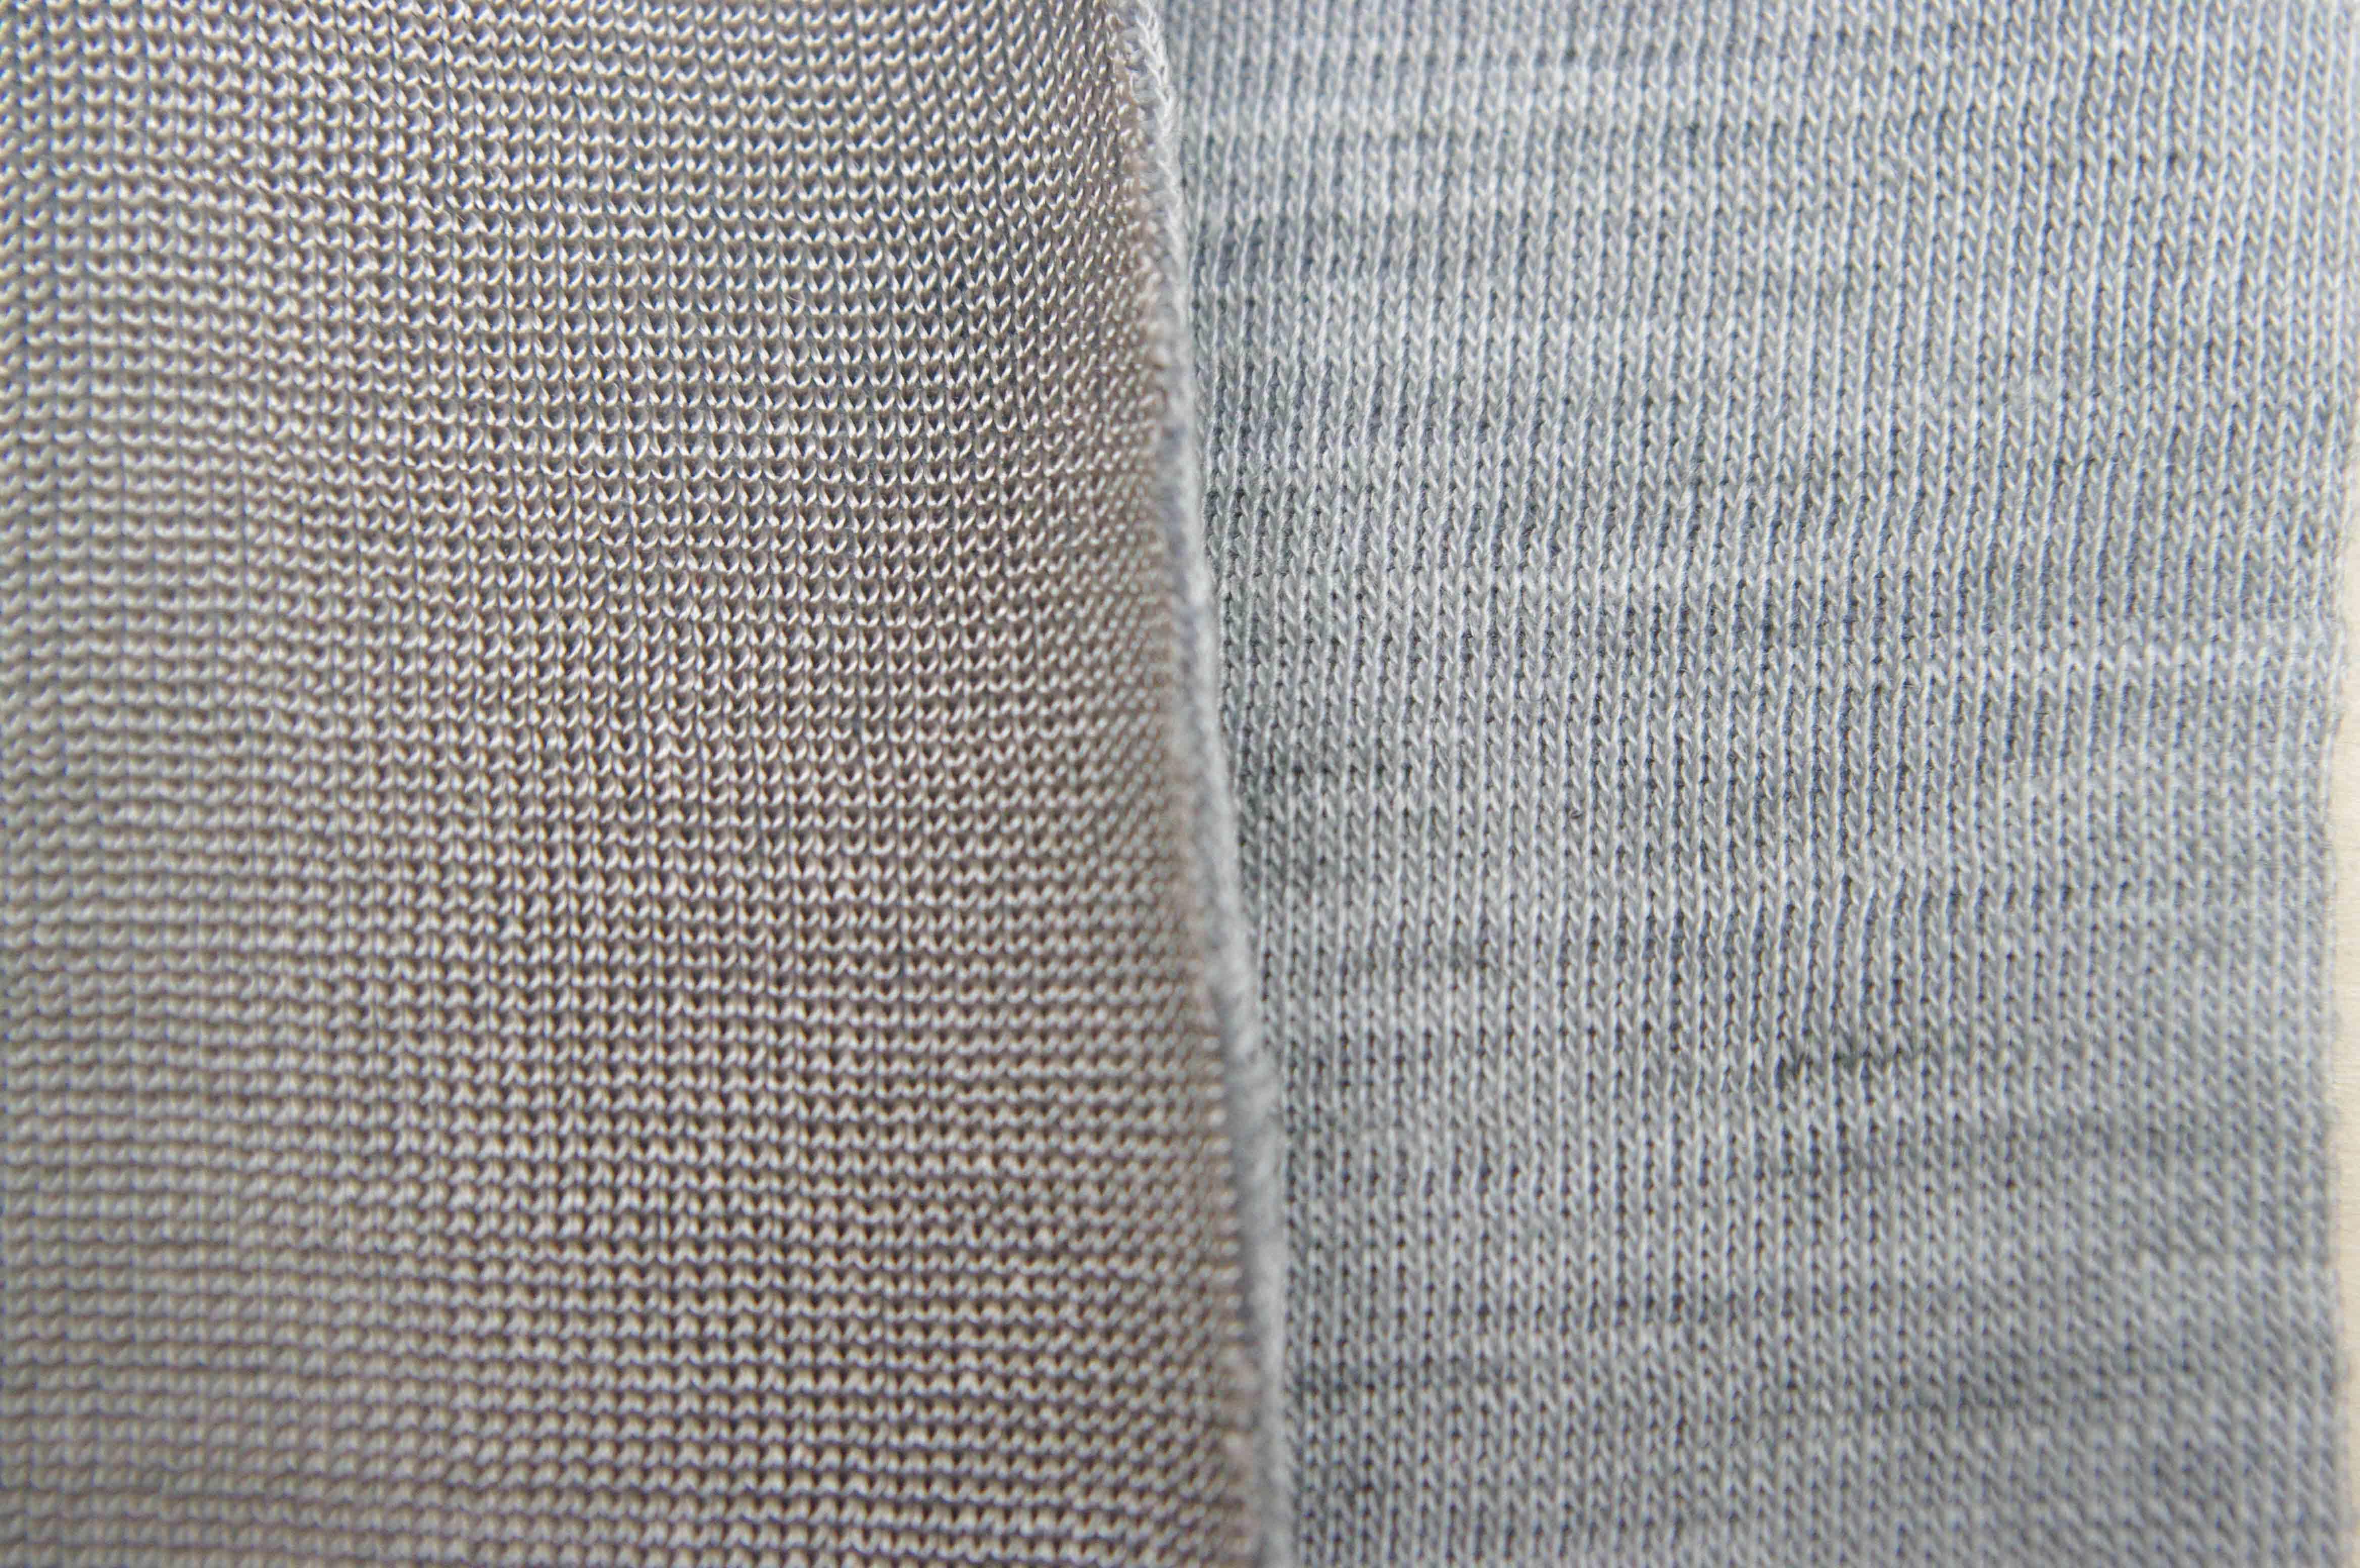 resistive_knitting_2